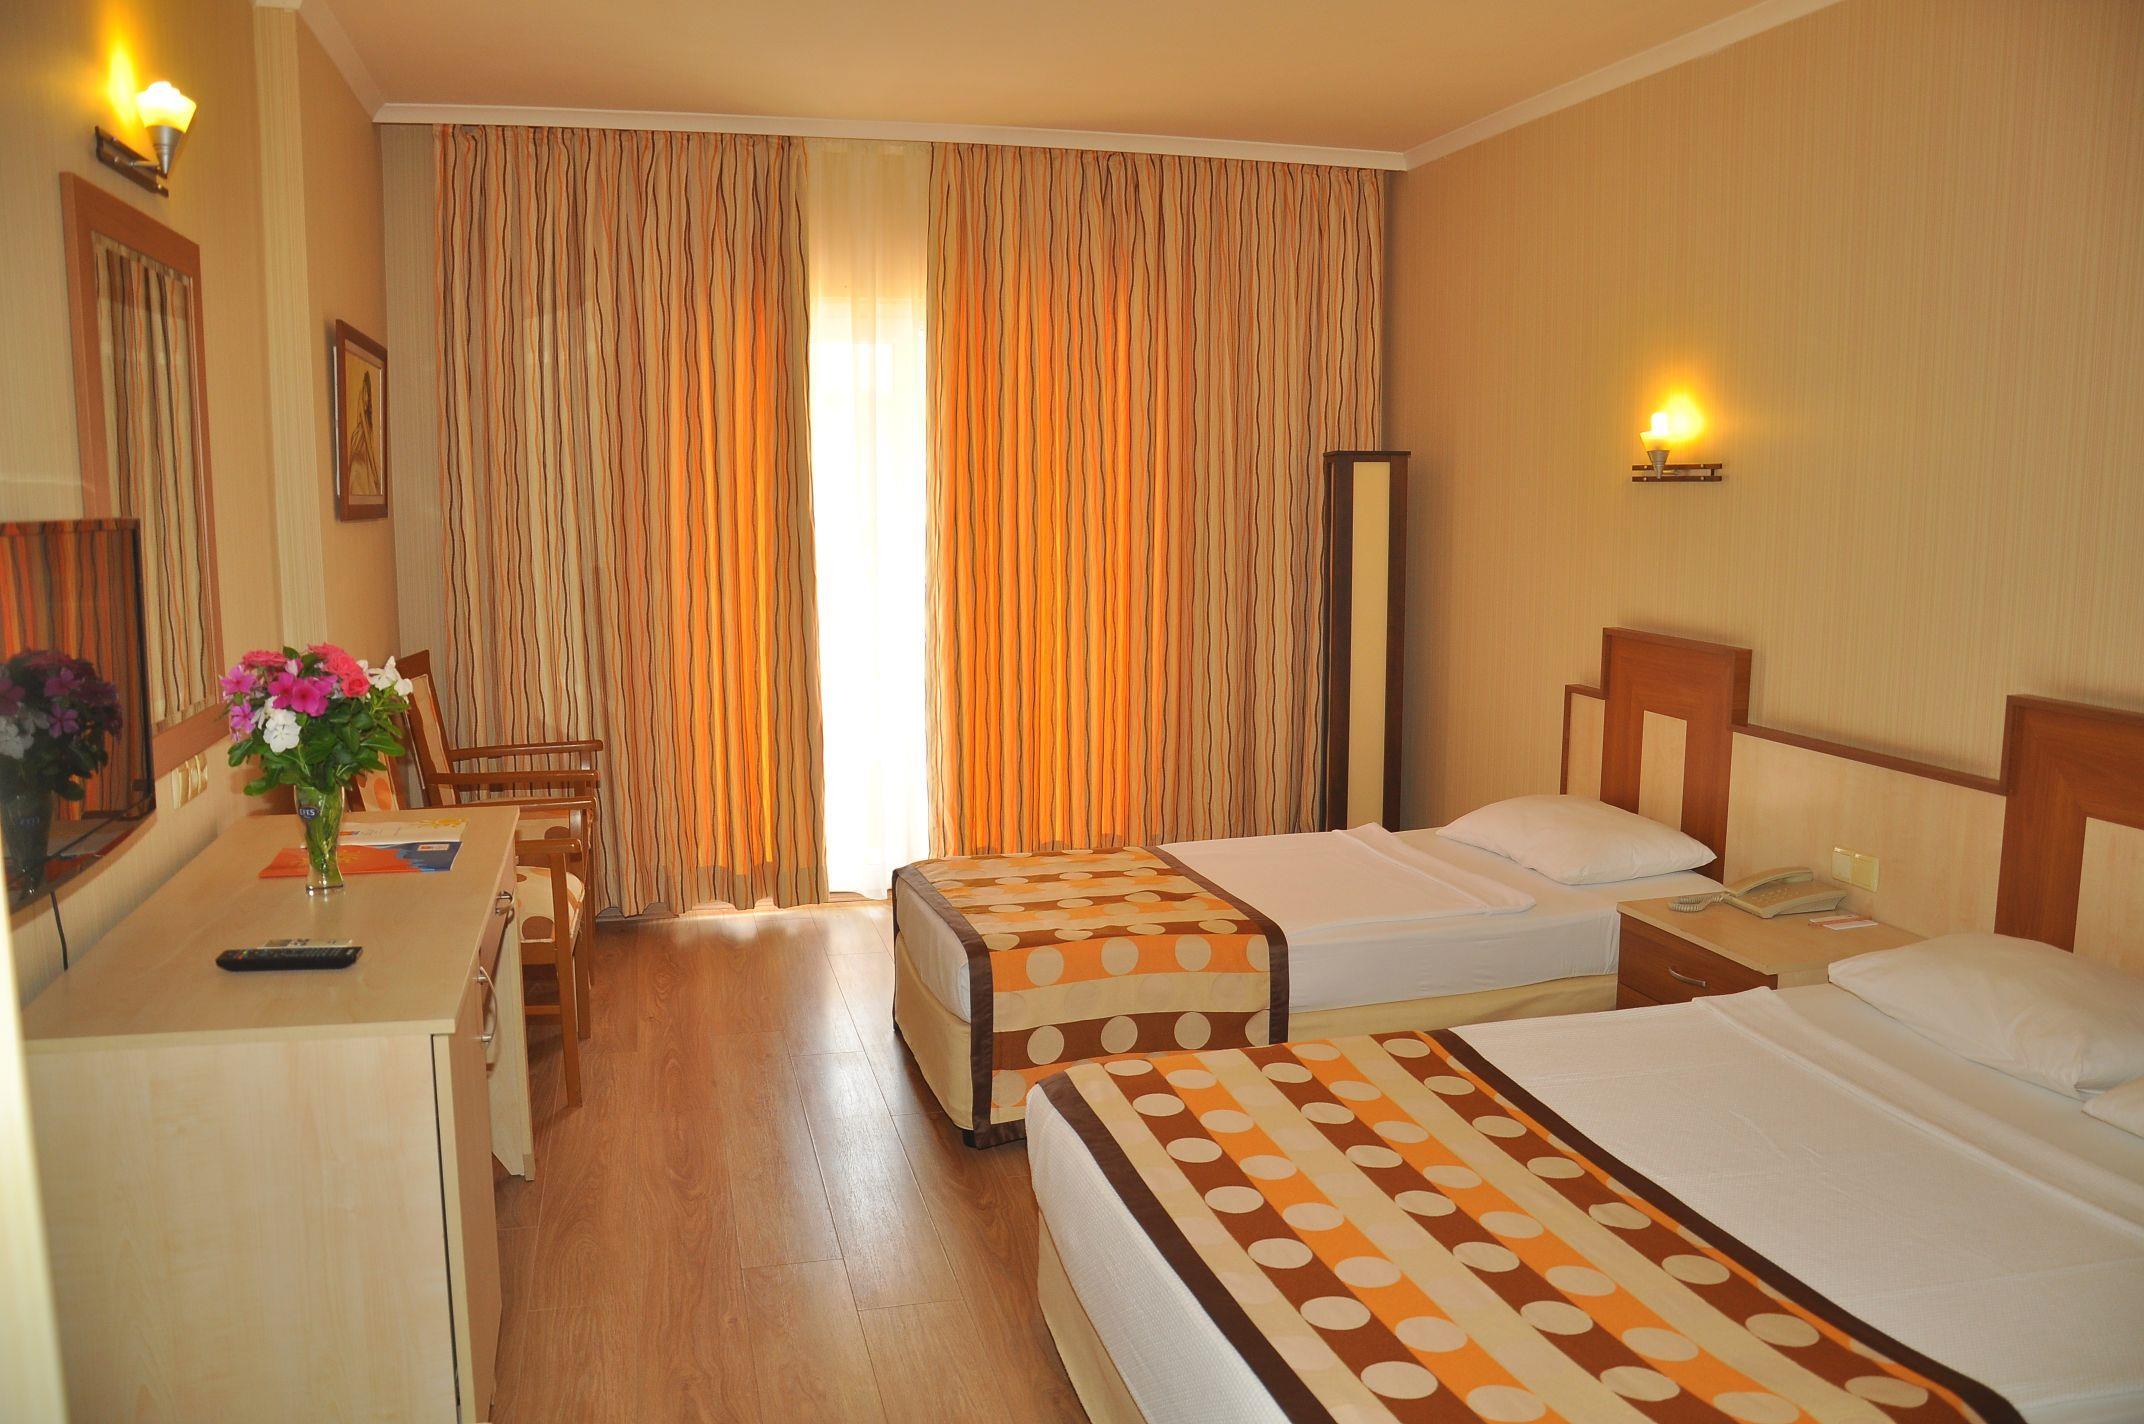 http://www.orextravel.sk/OREX/hotelphotos/stella-beach-hotel-alanya-general-0025.jpg